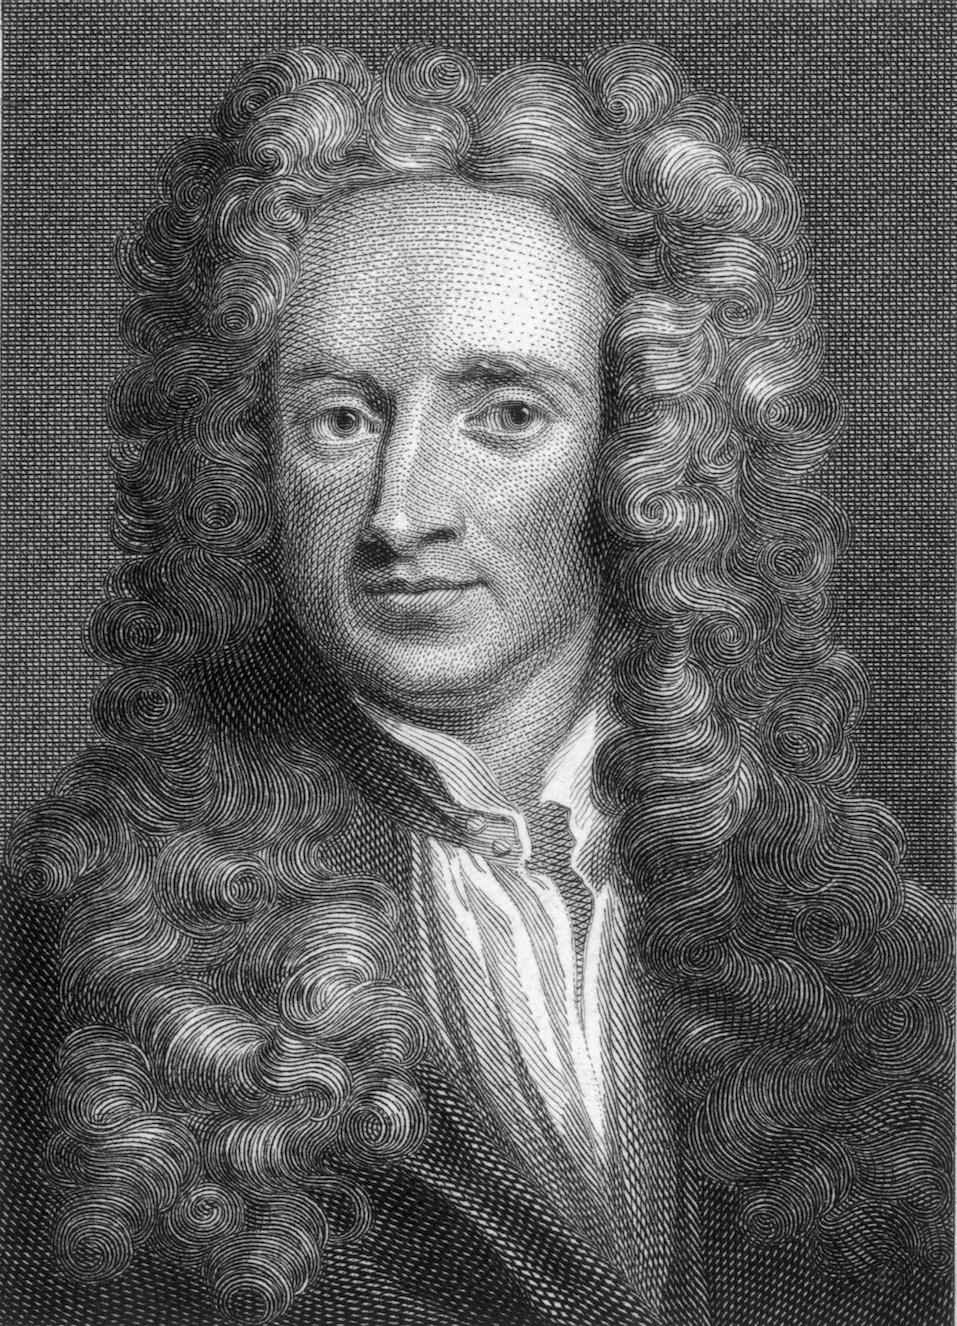 English physicist and mathematician Sir Isaac Newton